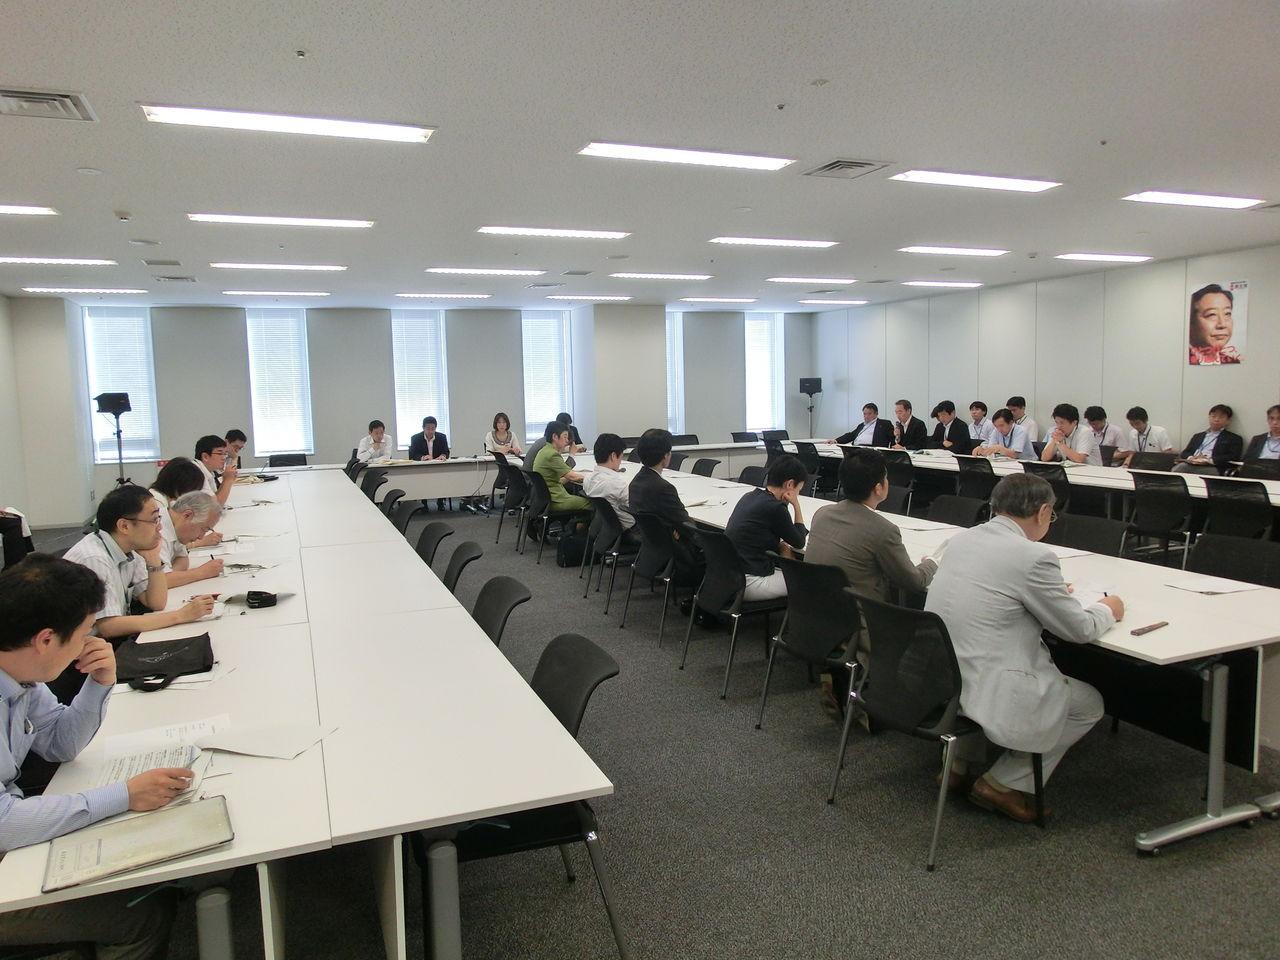 CIMG3226 外務部門会議が開かれました。日・ASEAN外相会議、日メコン外相会議、A...